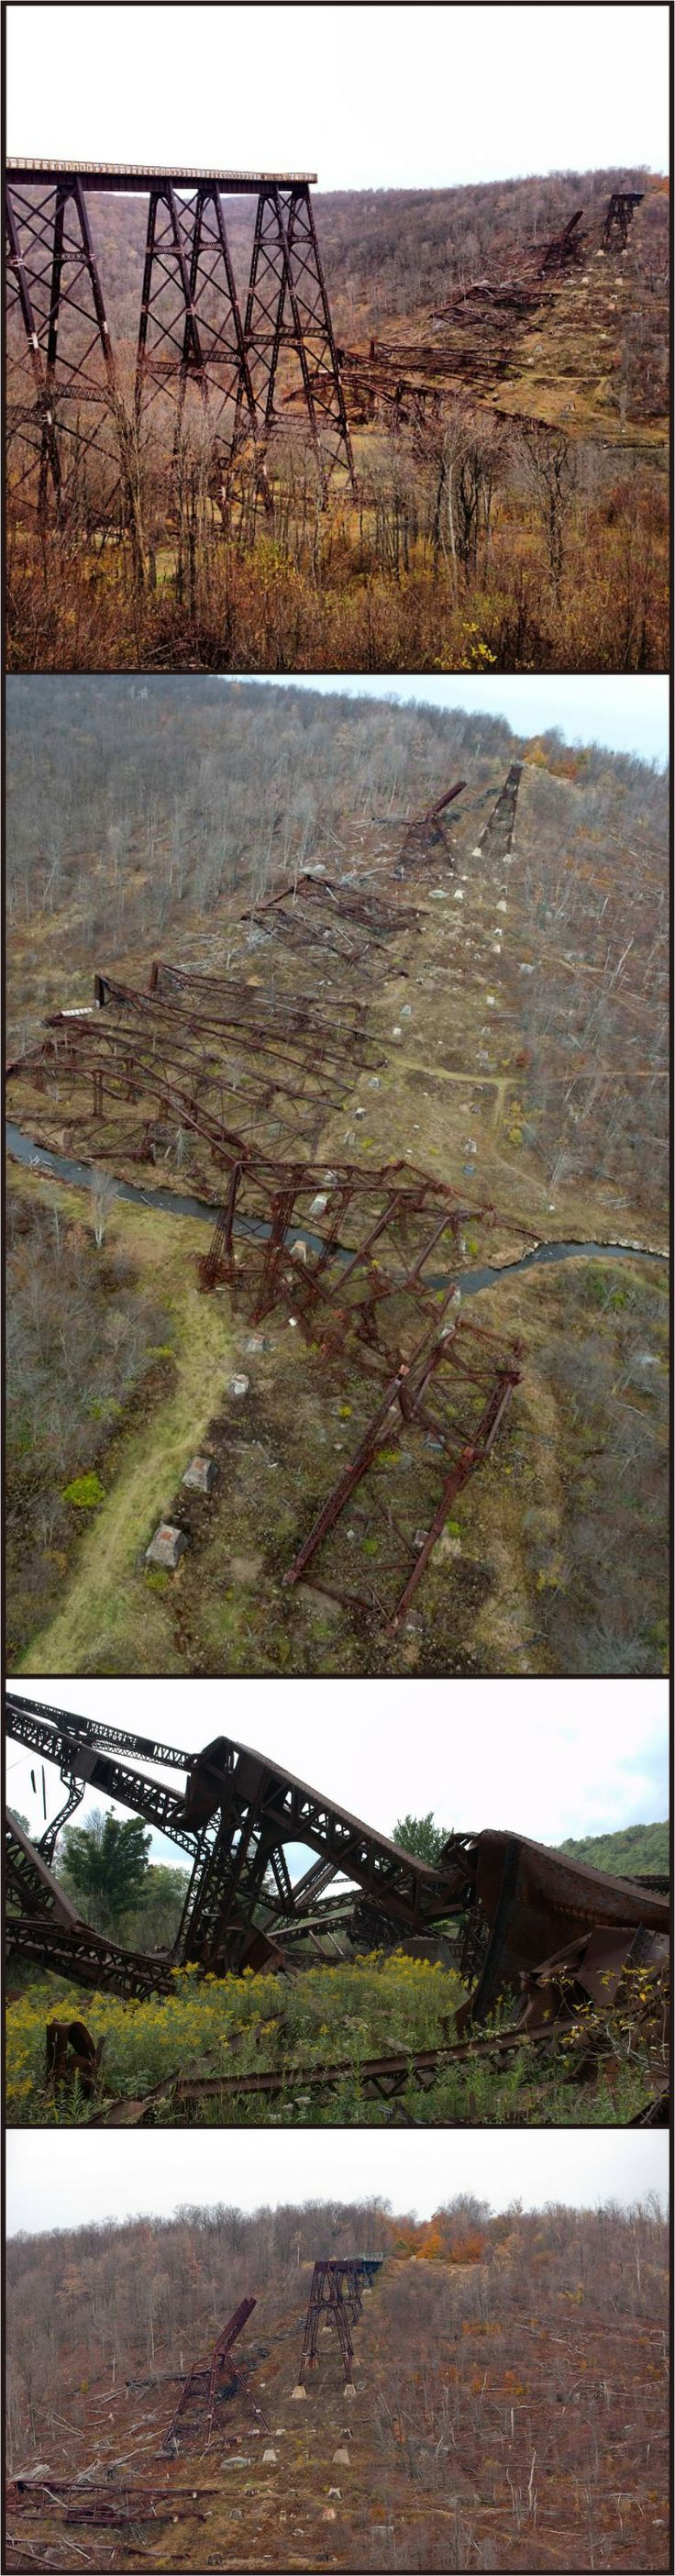 Kinzua Bridge: Once the World's Longest Railroad Bridge, Destroyed by Tornado